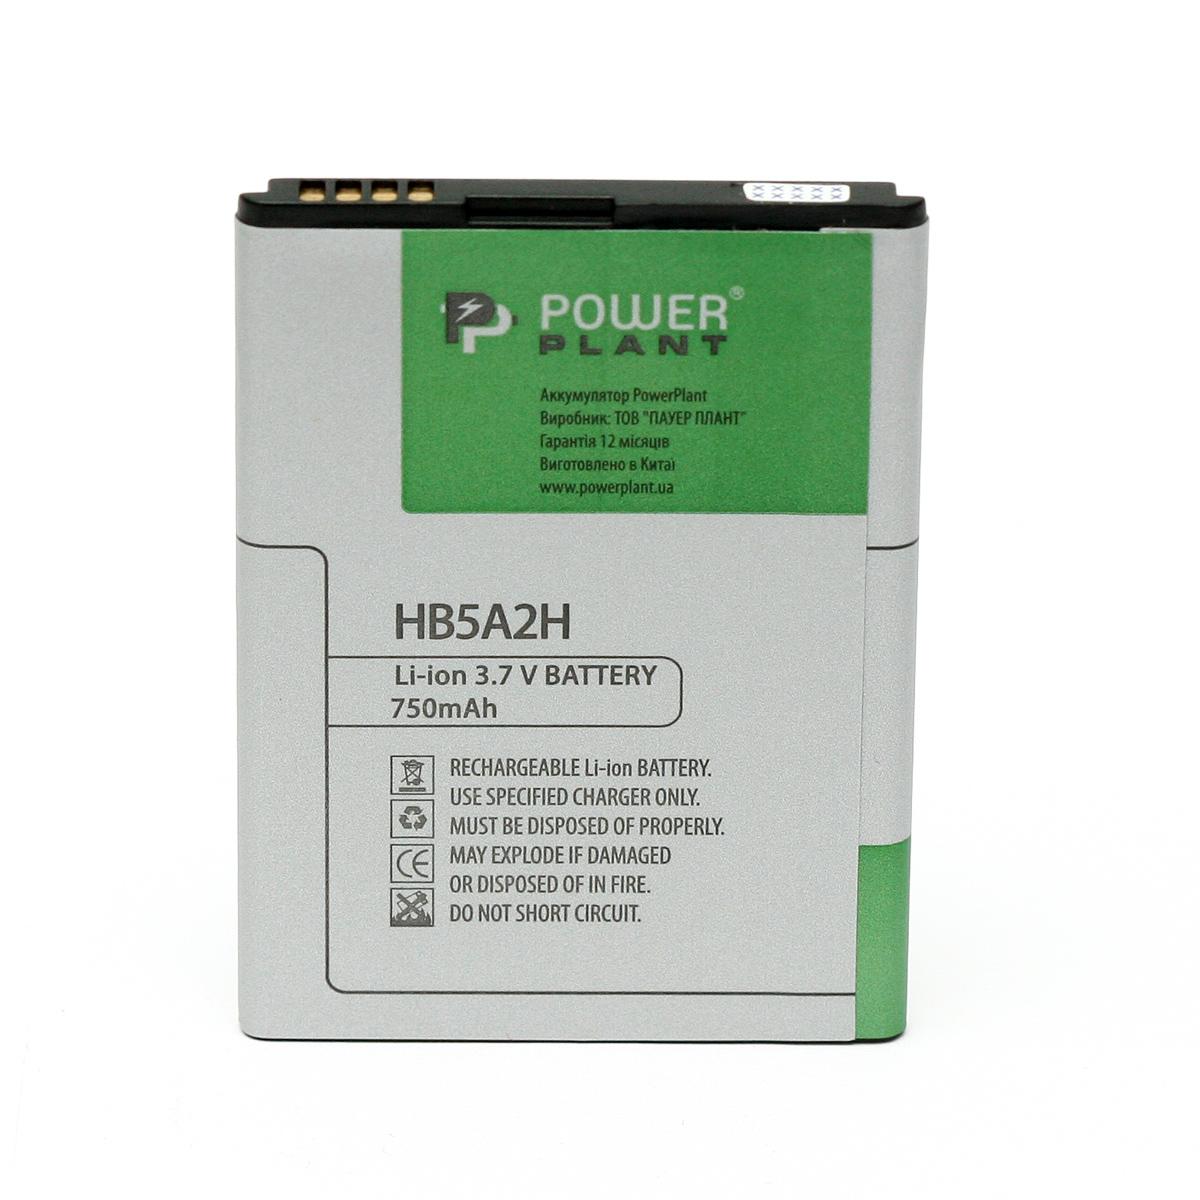 Купить Аккумулятор PowerPlant Huawei CS366 (HB5A2H) 750mAh